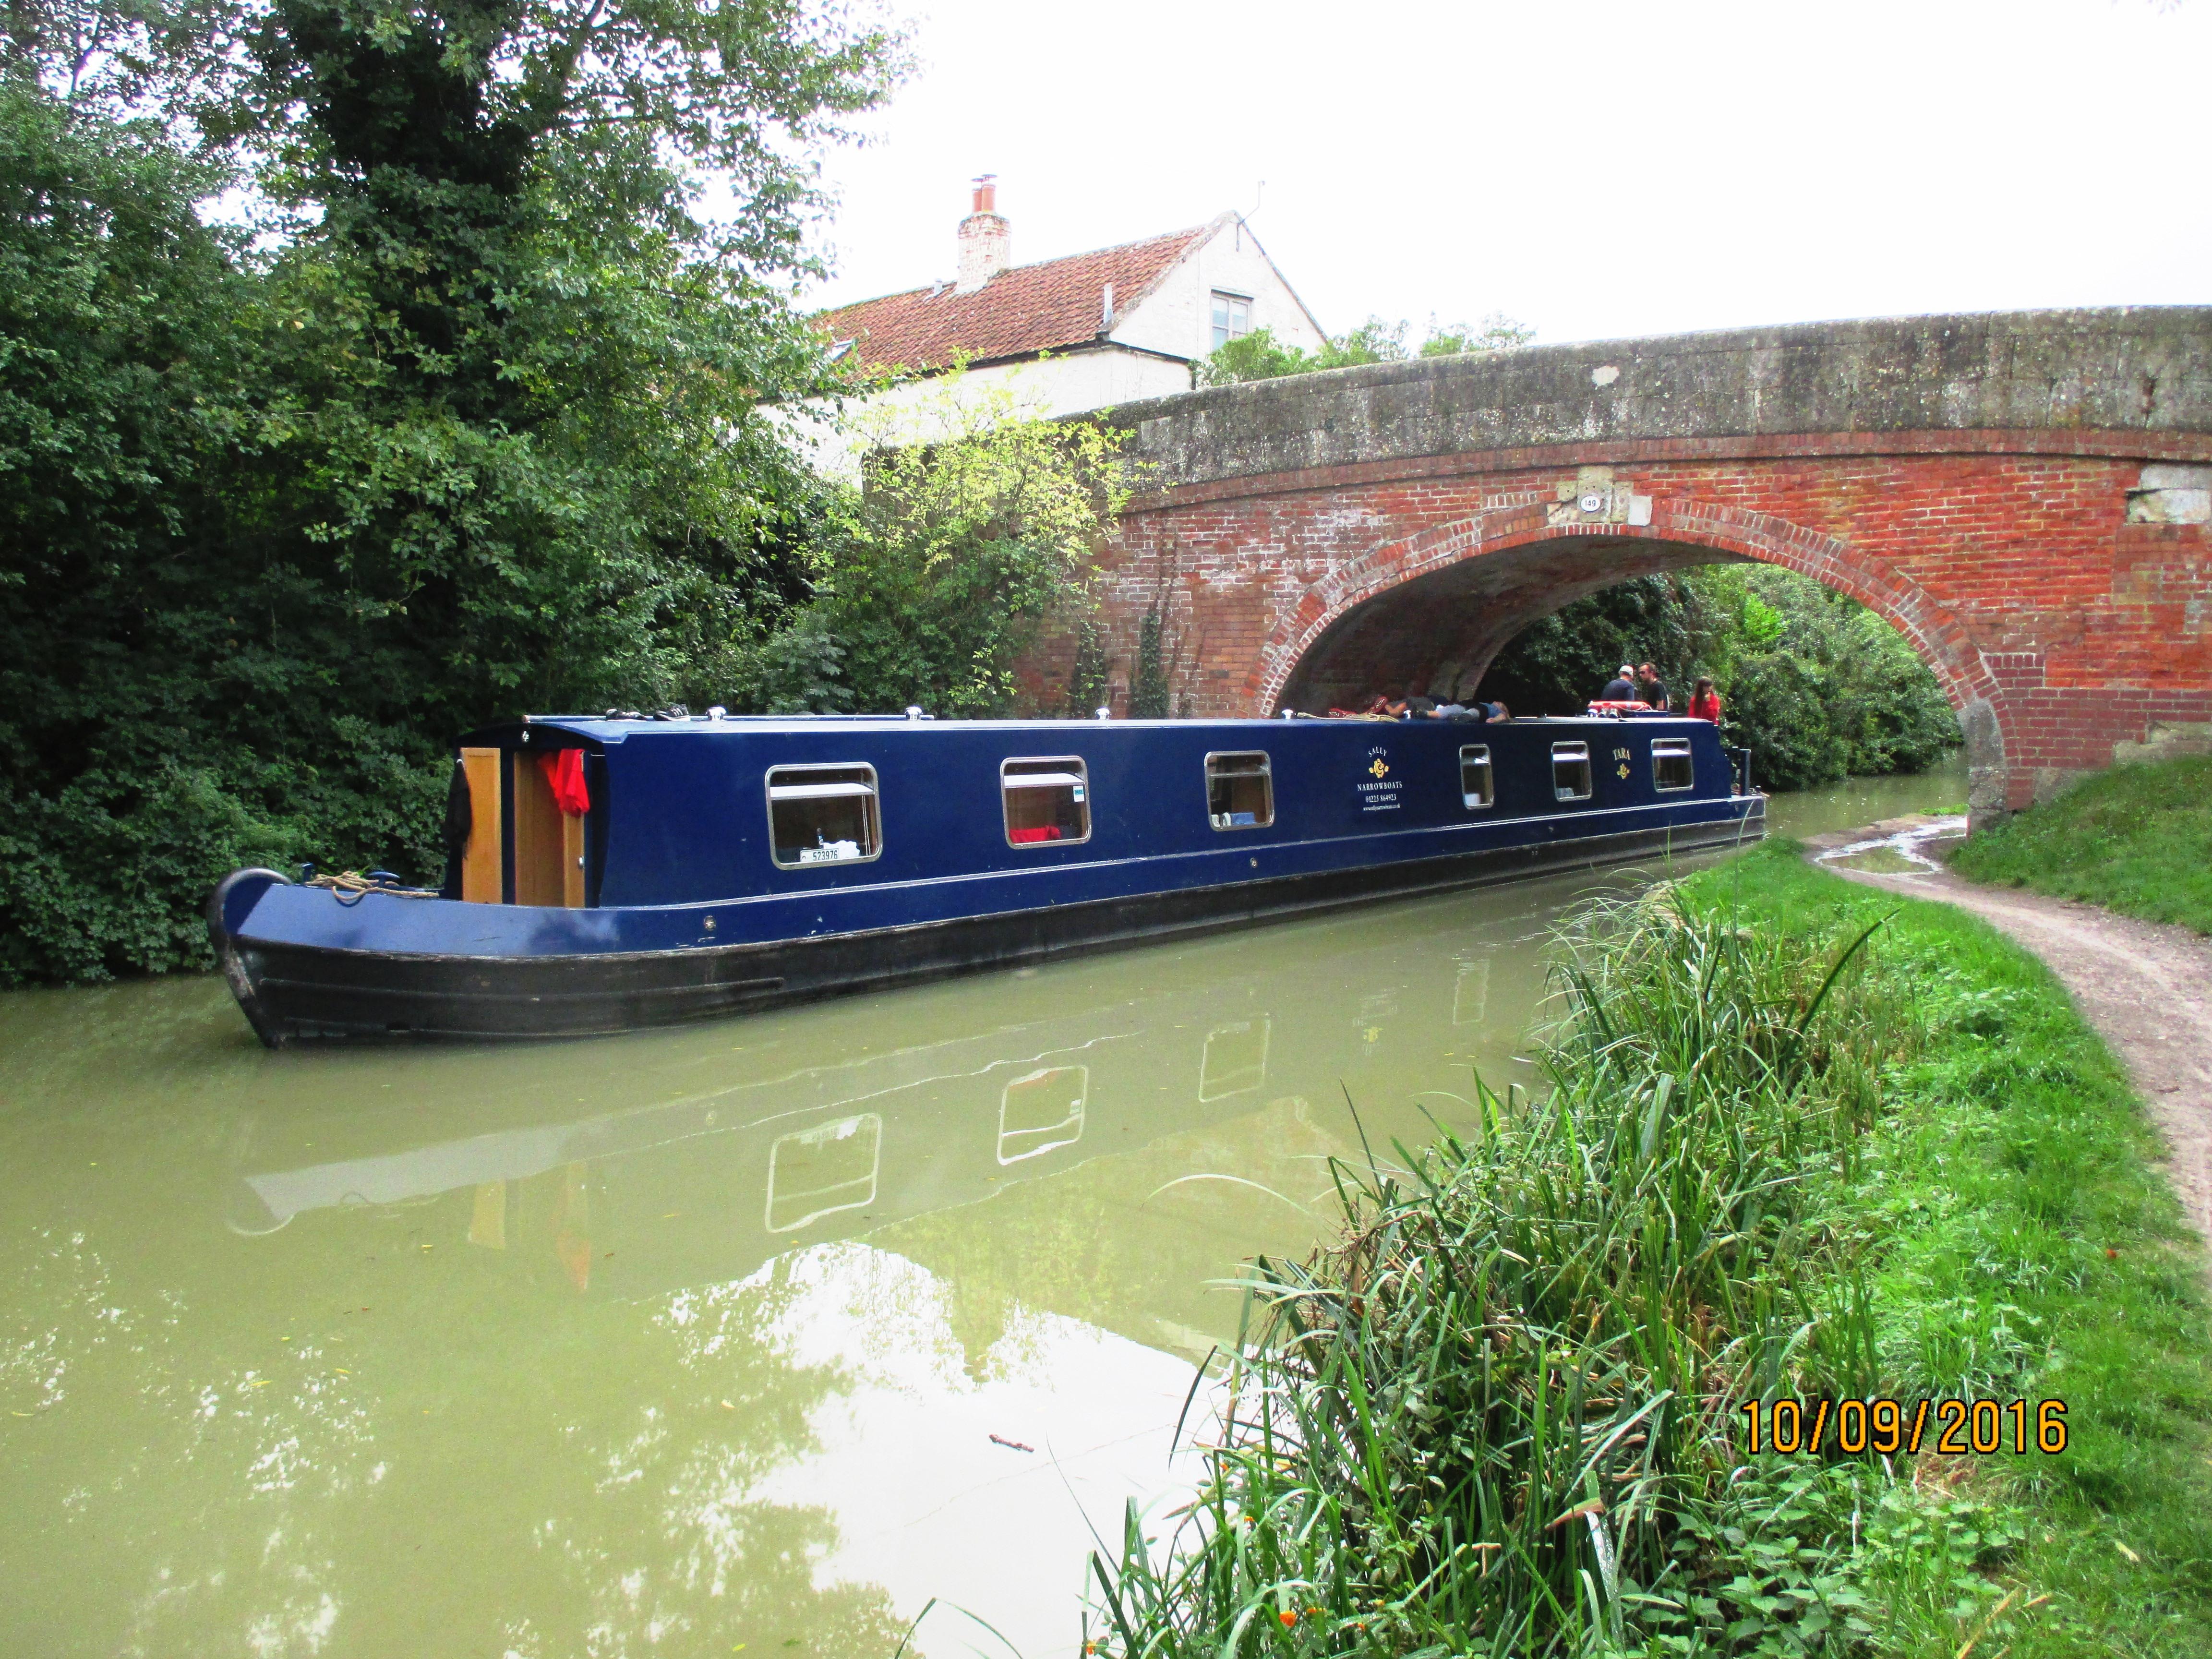 The S-Tara class canal boat